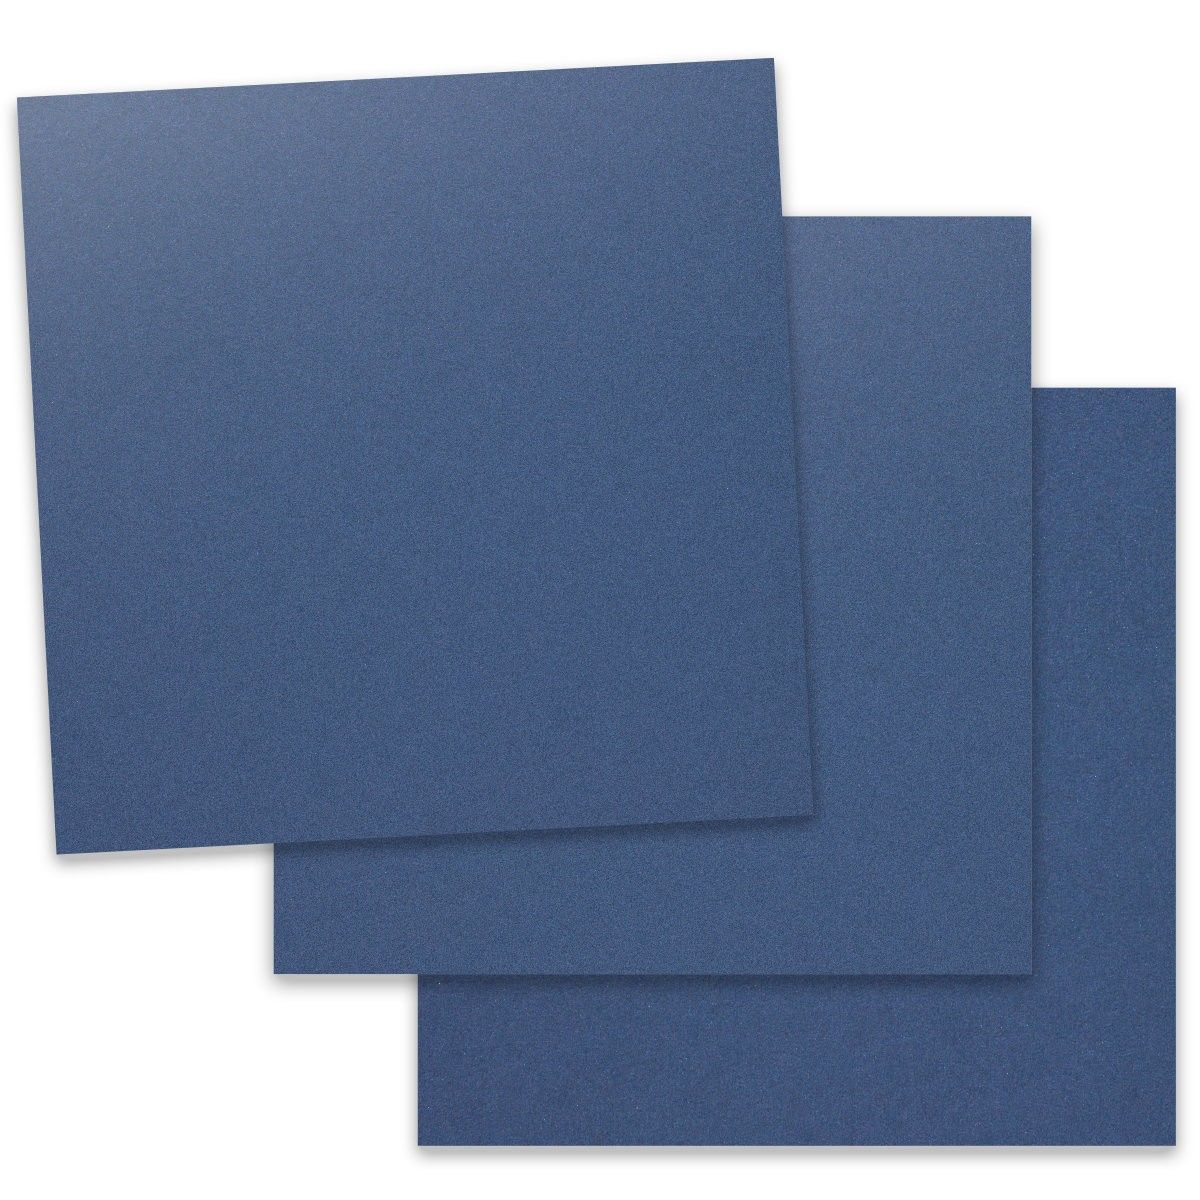 Curious Metallic Electric Blue 12 X 12 Cardstock Paper 300 Gsm